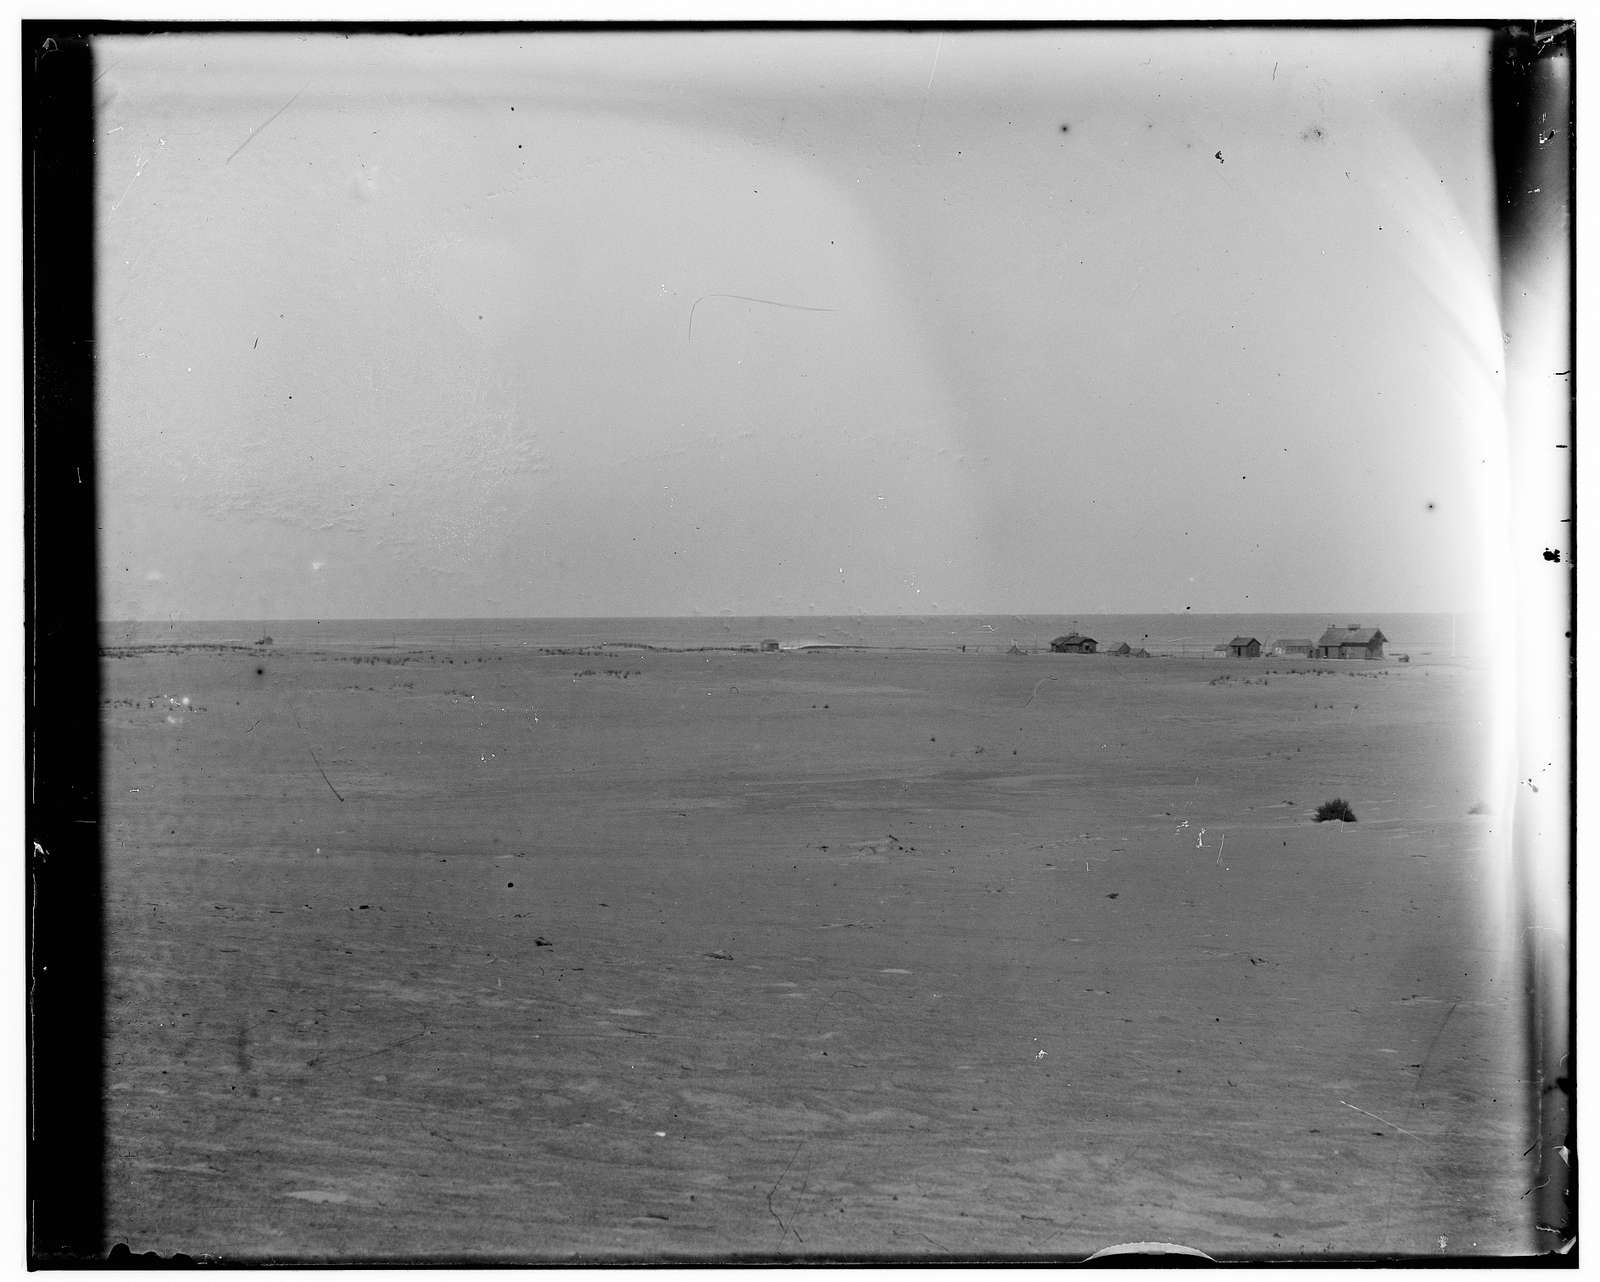 [Long-range view of the Kitty Hawk Lifesaving Station and Weather Bureau Station]